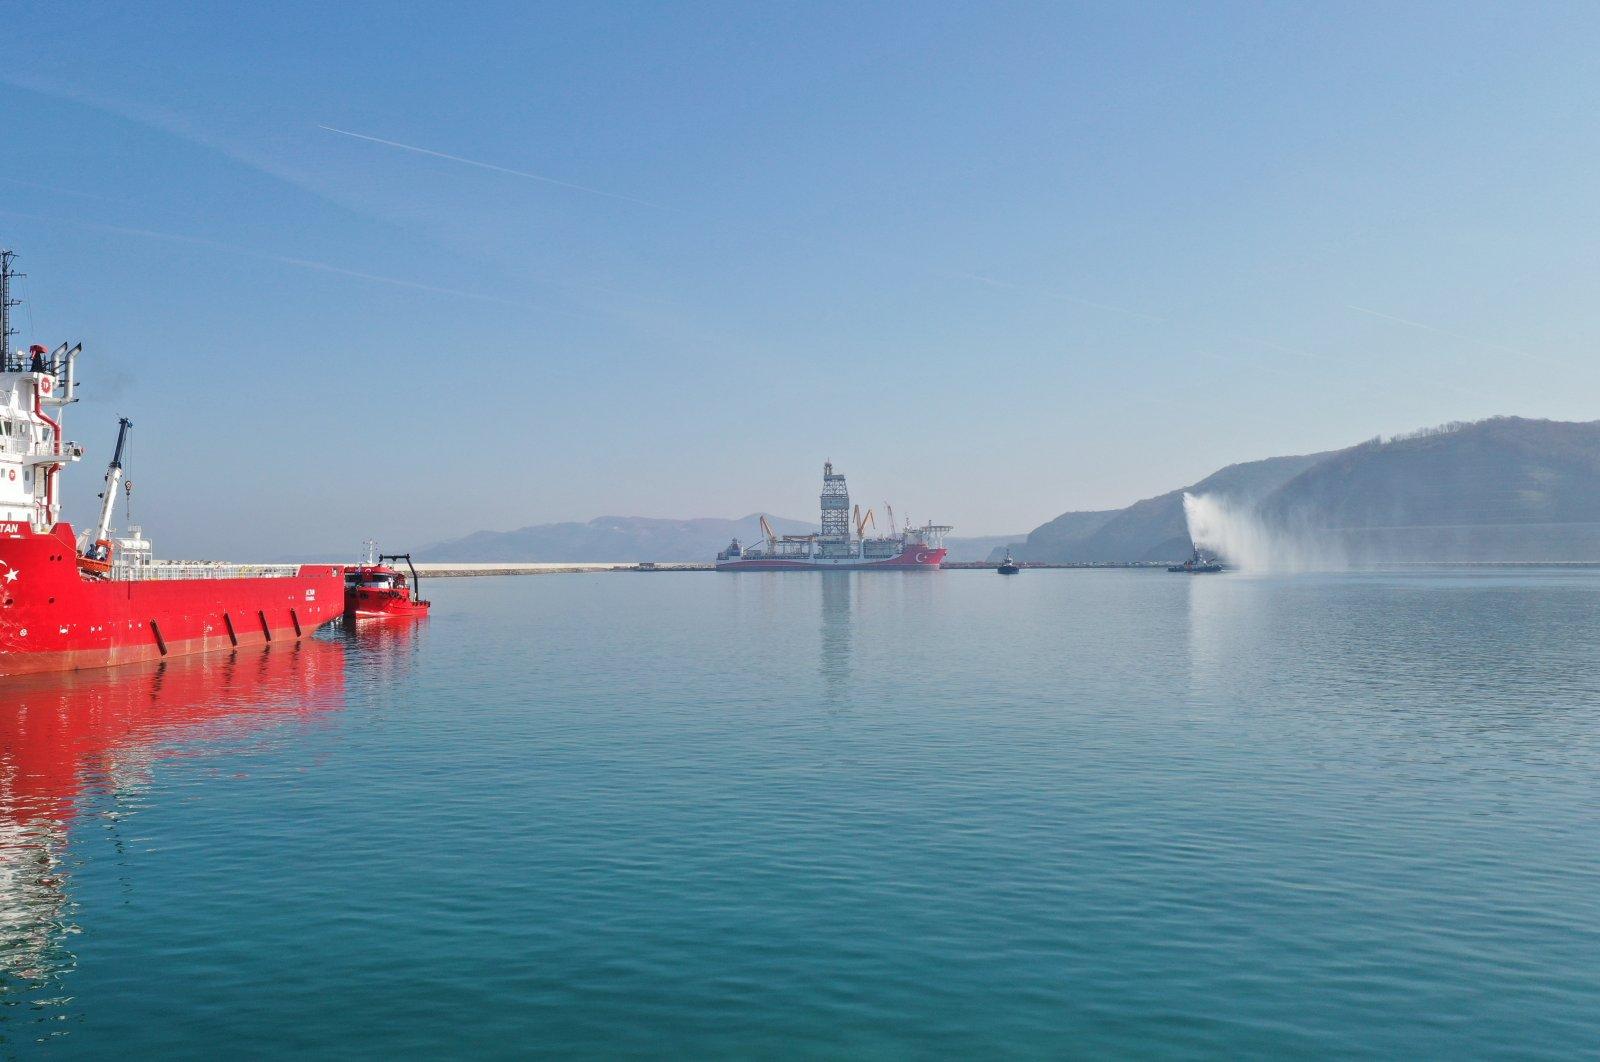 The Kanuni drillship in the background at the Filyos port in Zonguldak, northern Turkey, Feb. 26, 2021. (AA Photo)